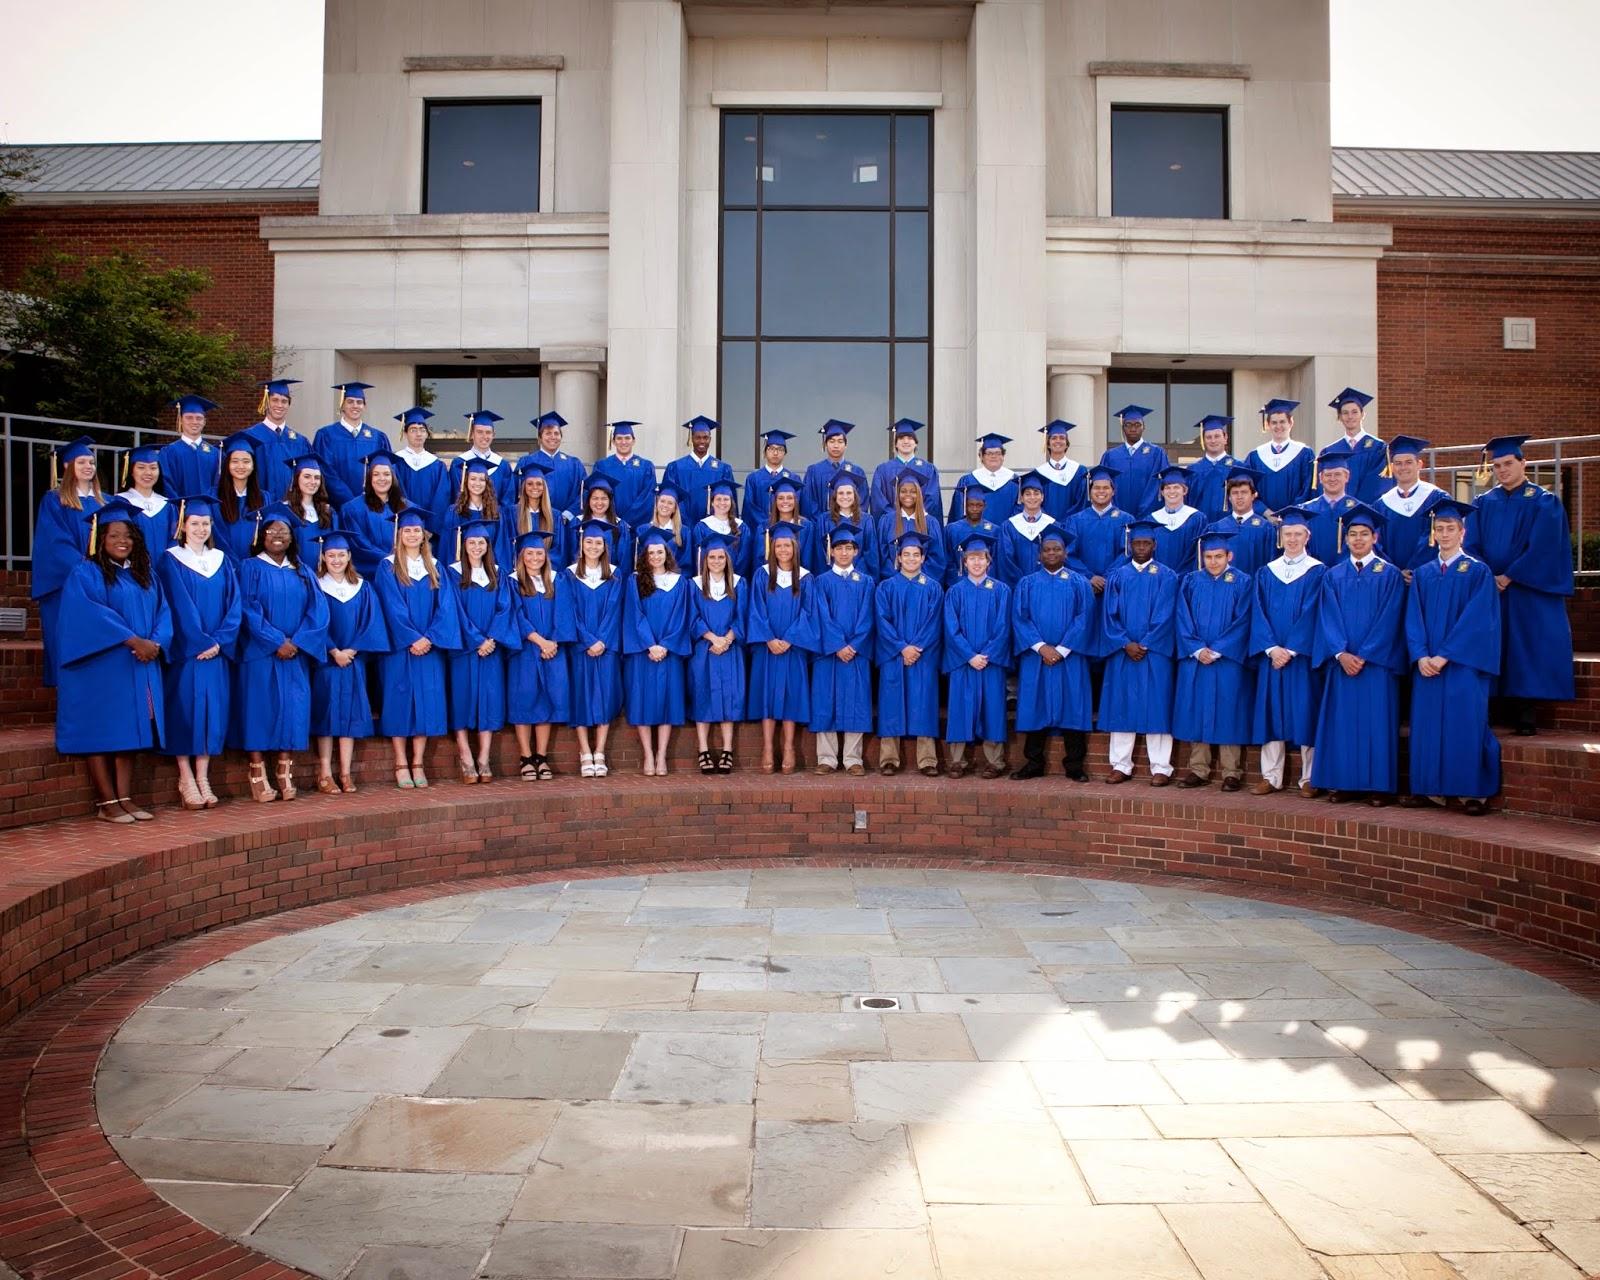 Montgomery Catholic Preparatory School Celebrates the 139th Graduating Class: The Class of 2014 1